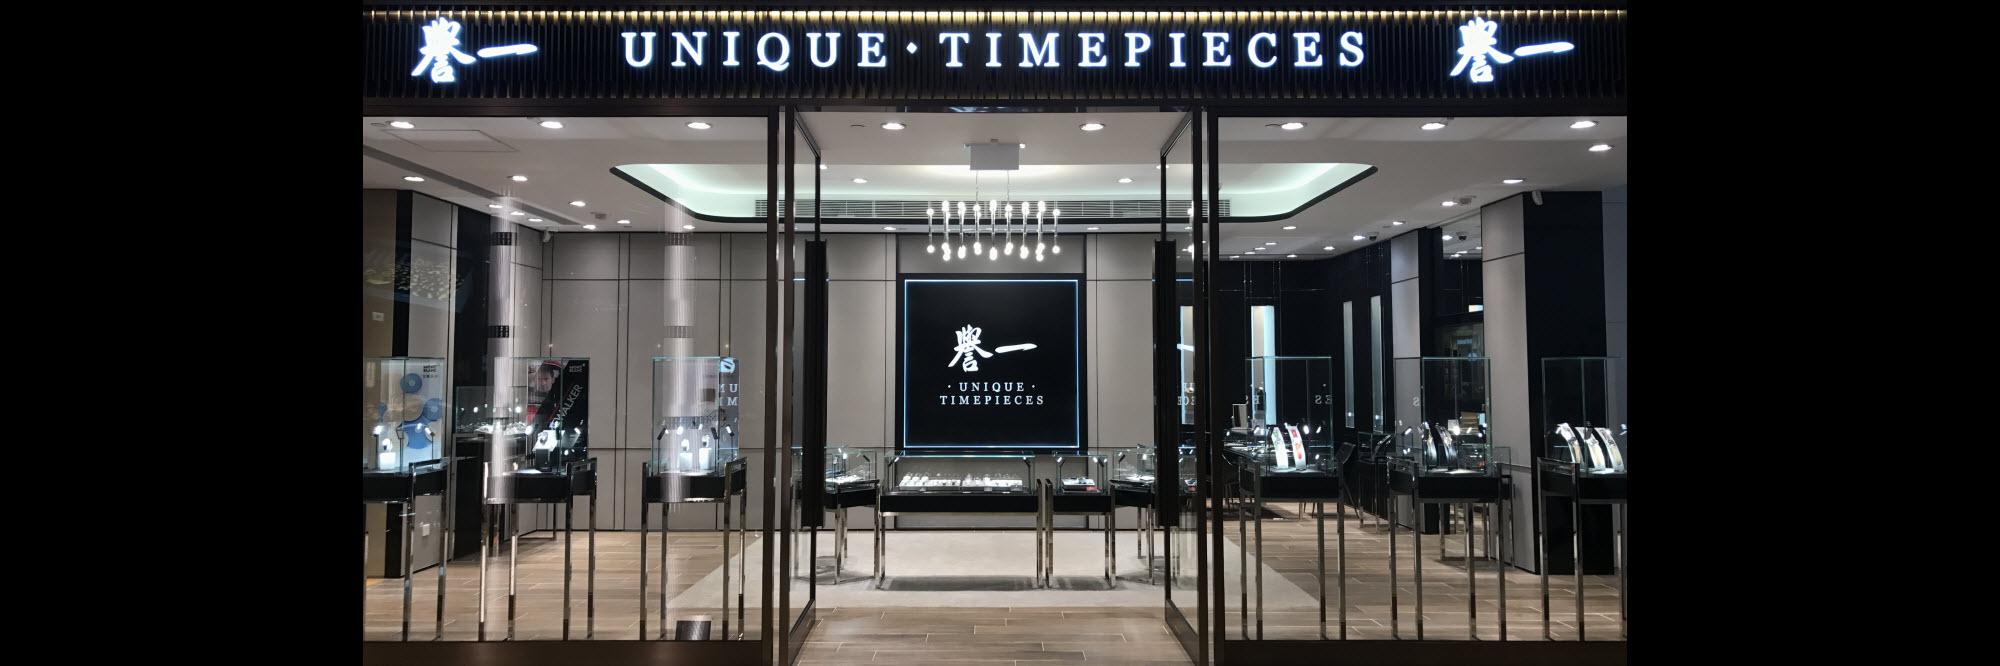 Unique Timepieces